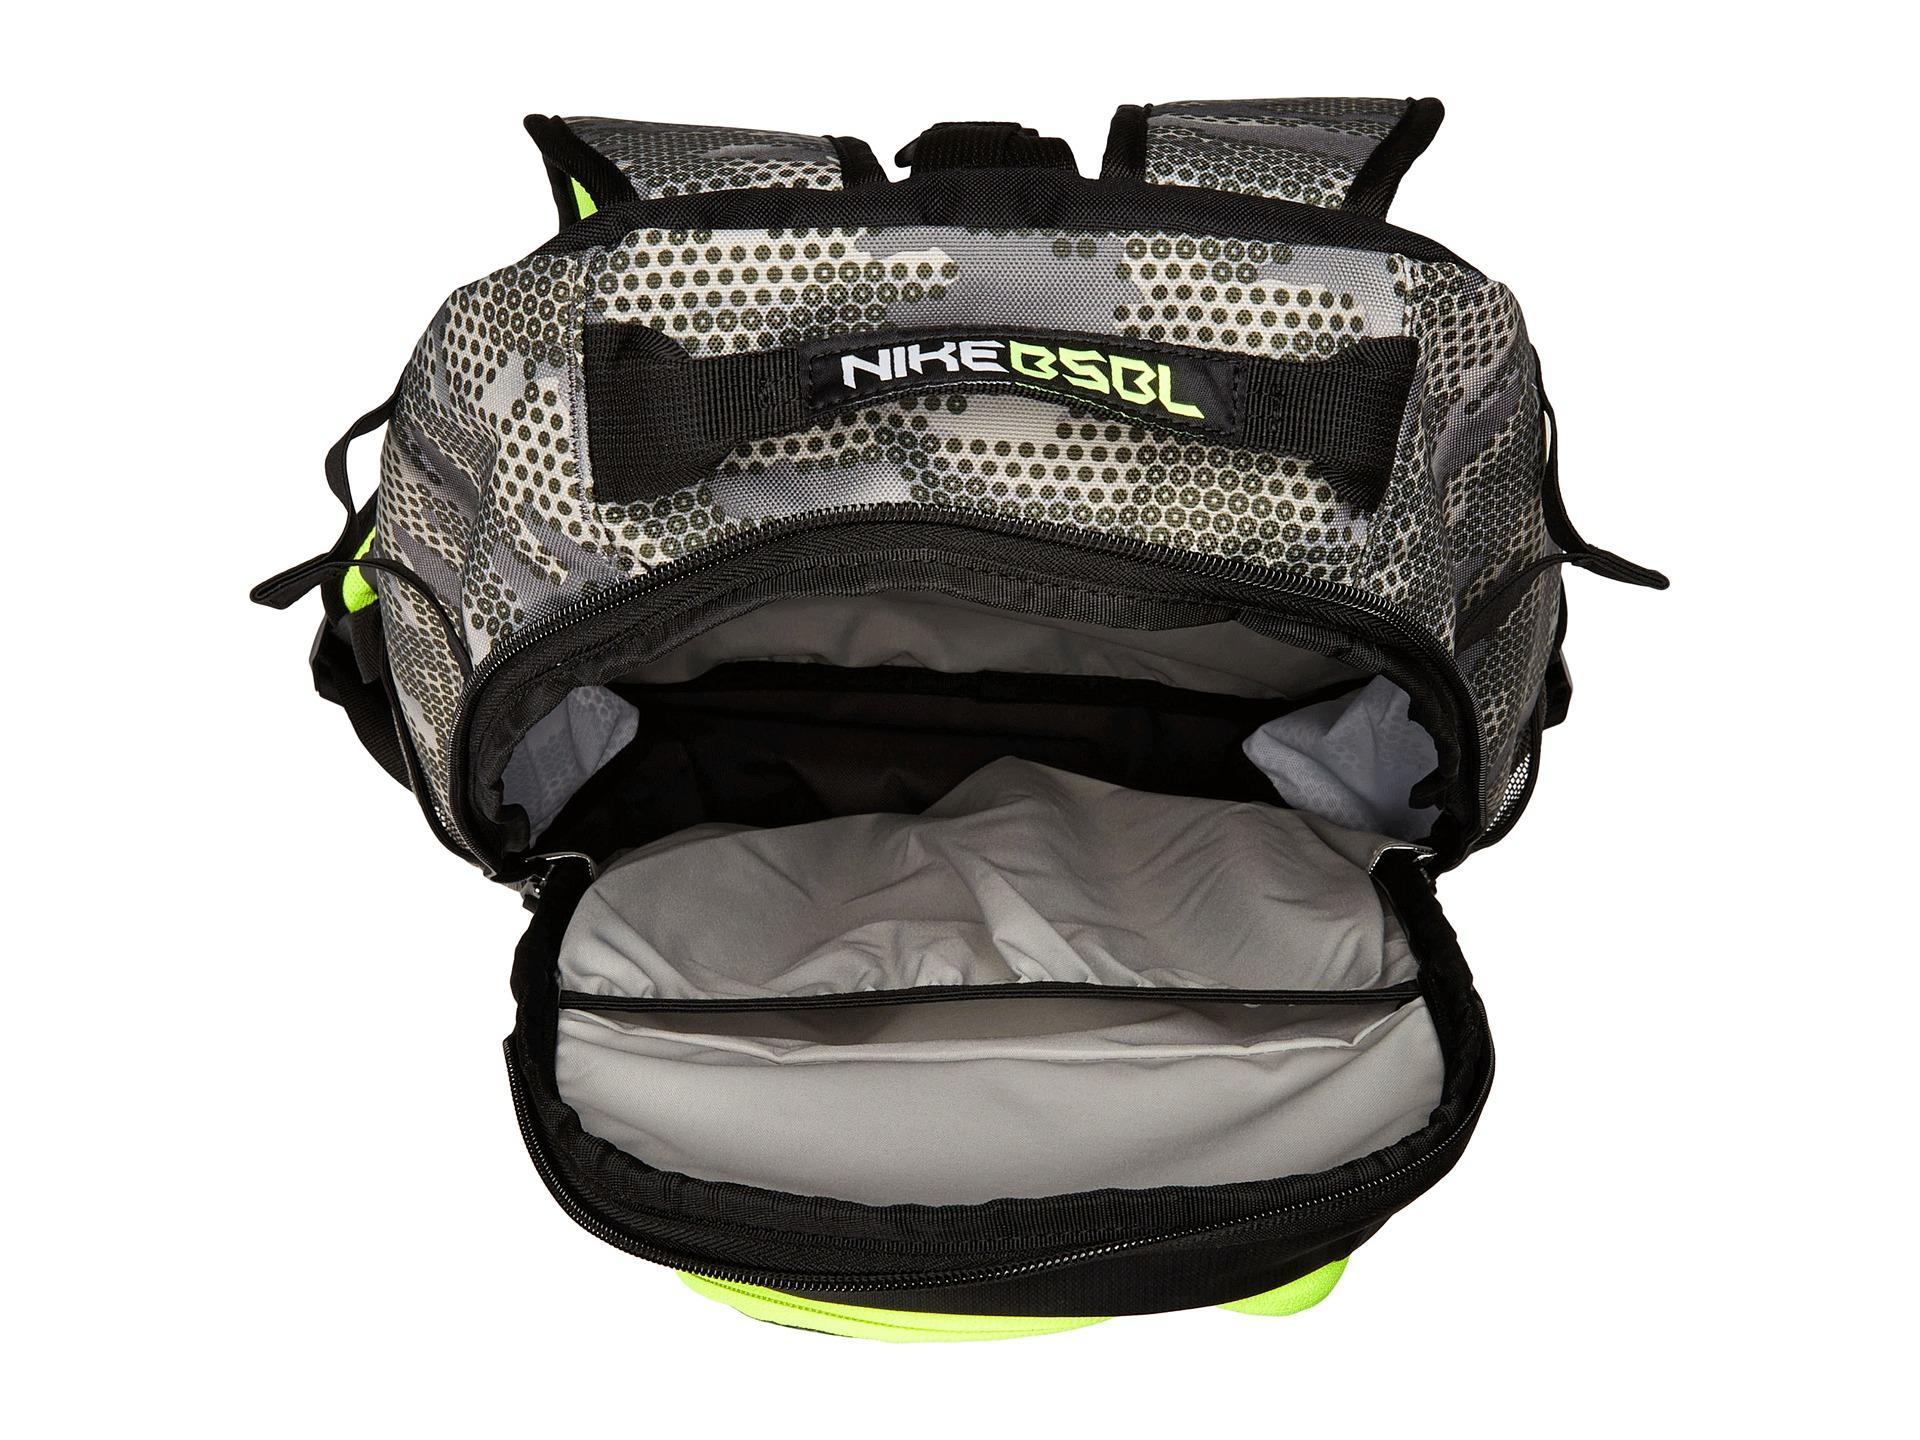 53fd1235d1 Lyst - Nike Vapor Select Bat Backpack Graphic in Gray for Men